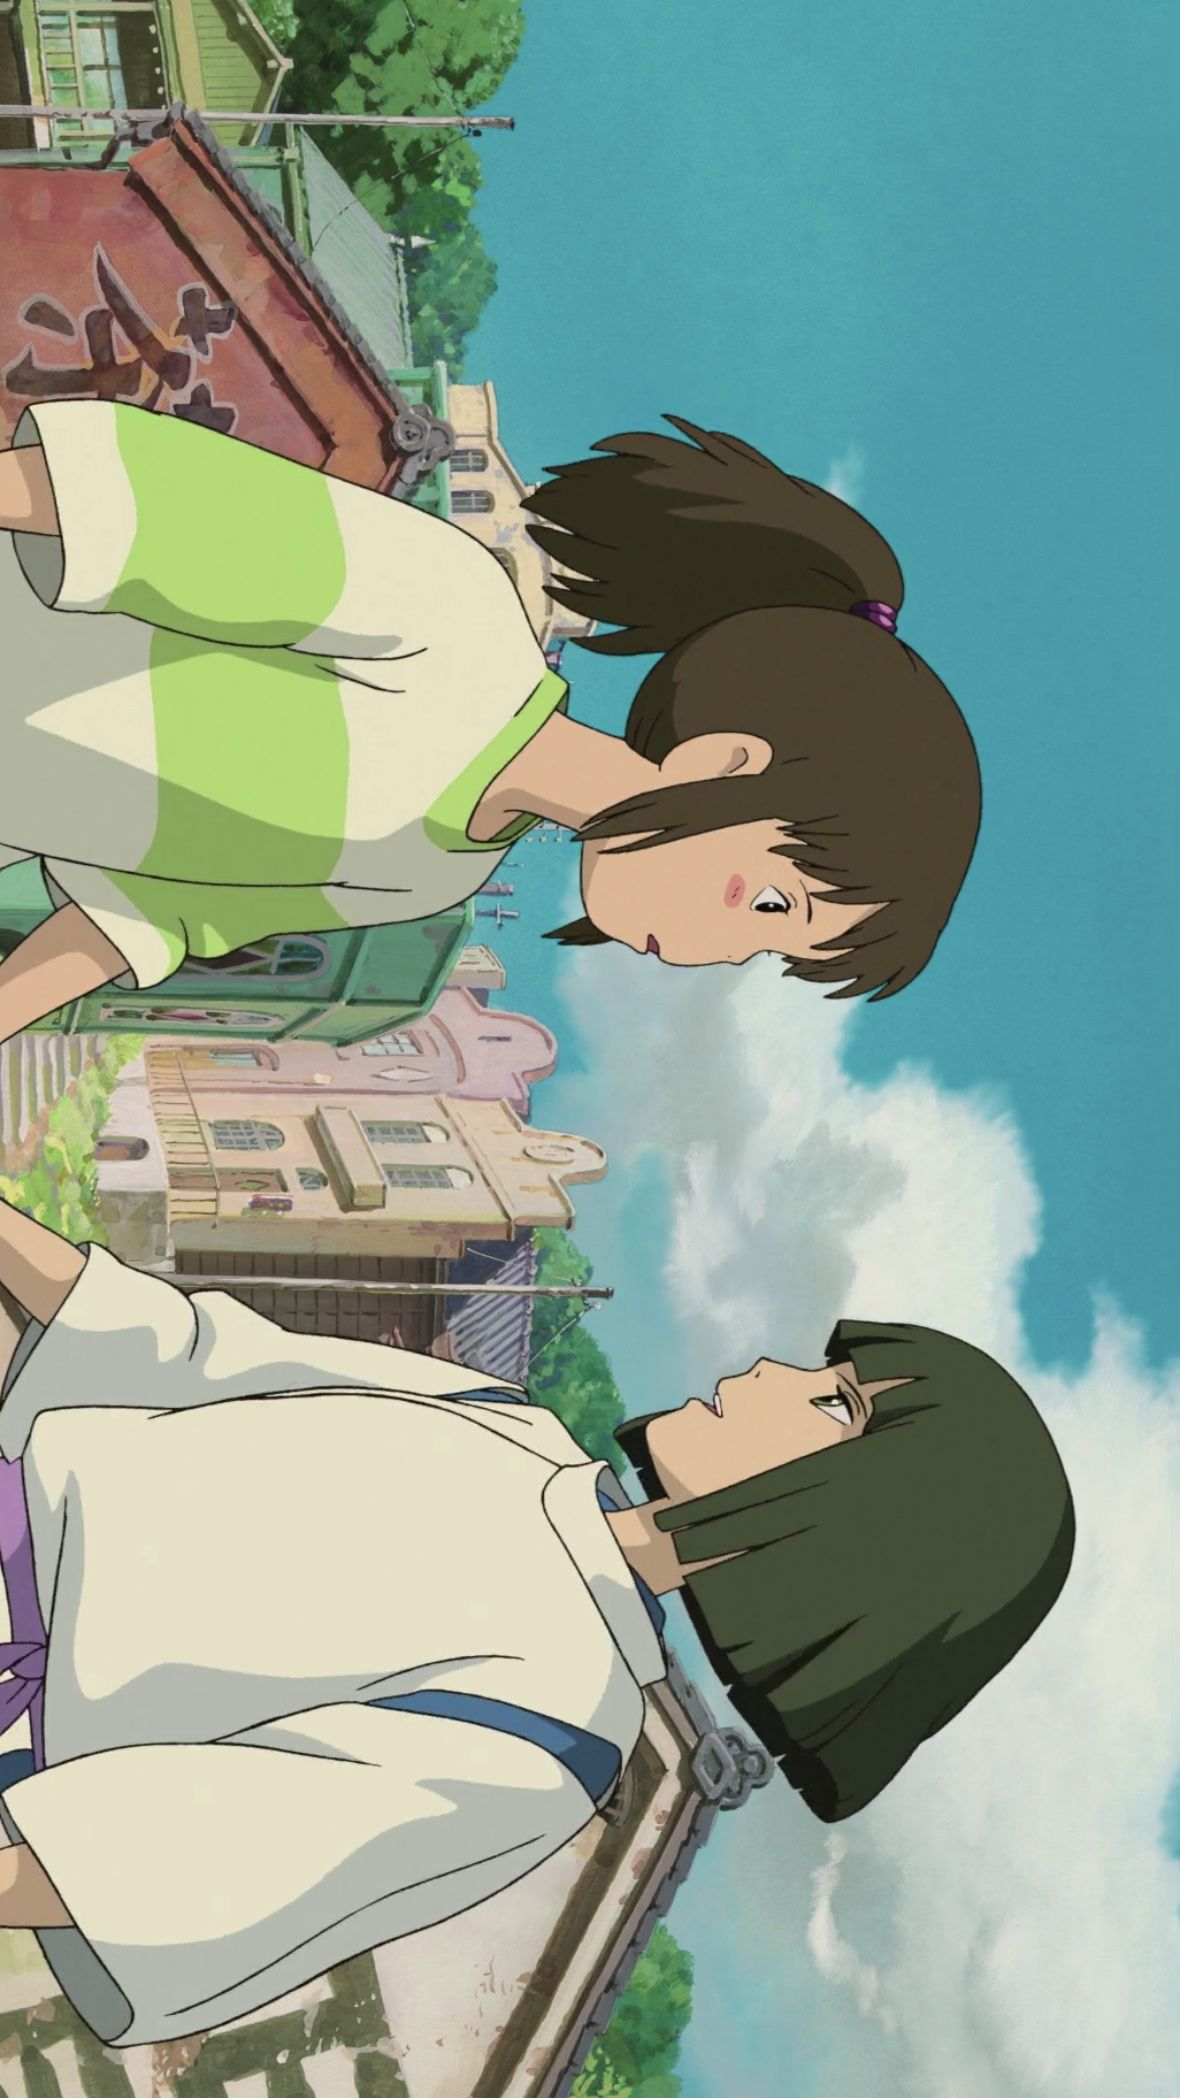 C H I H I R O En 2020 Le Voyage De Chihiro Illustrations Animees Projets De Dessin